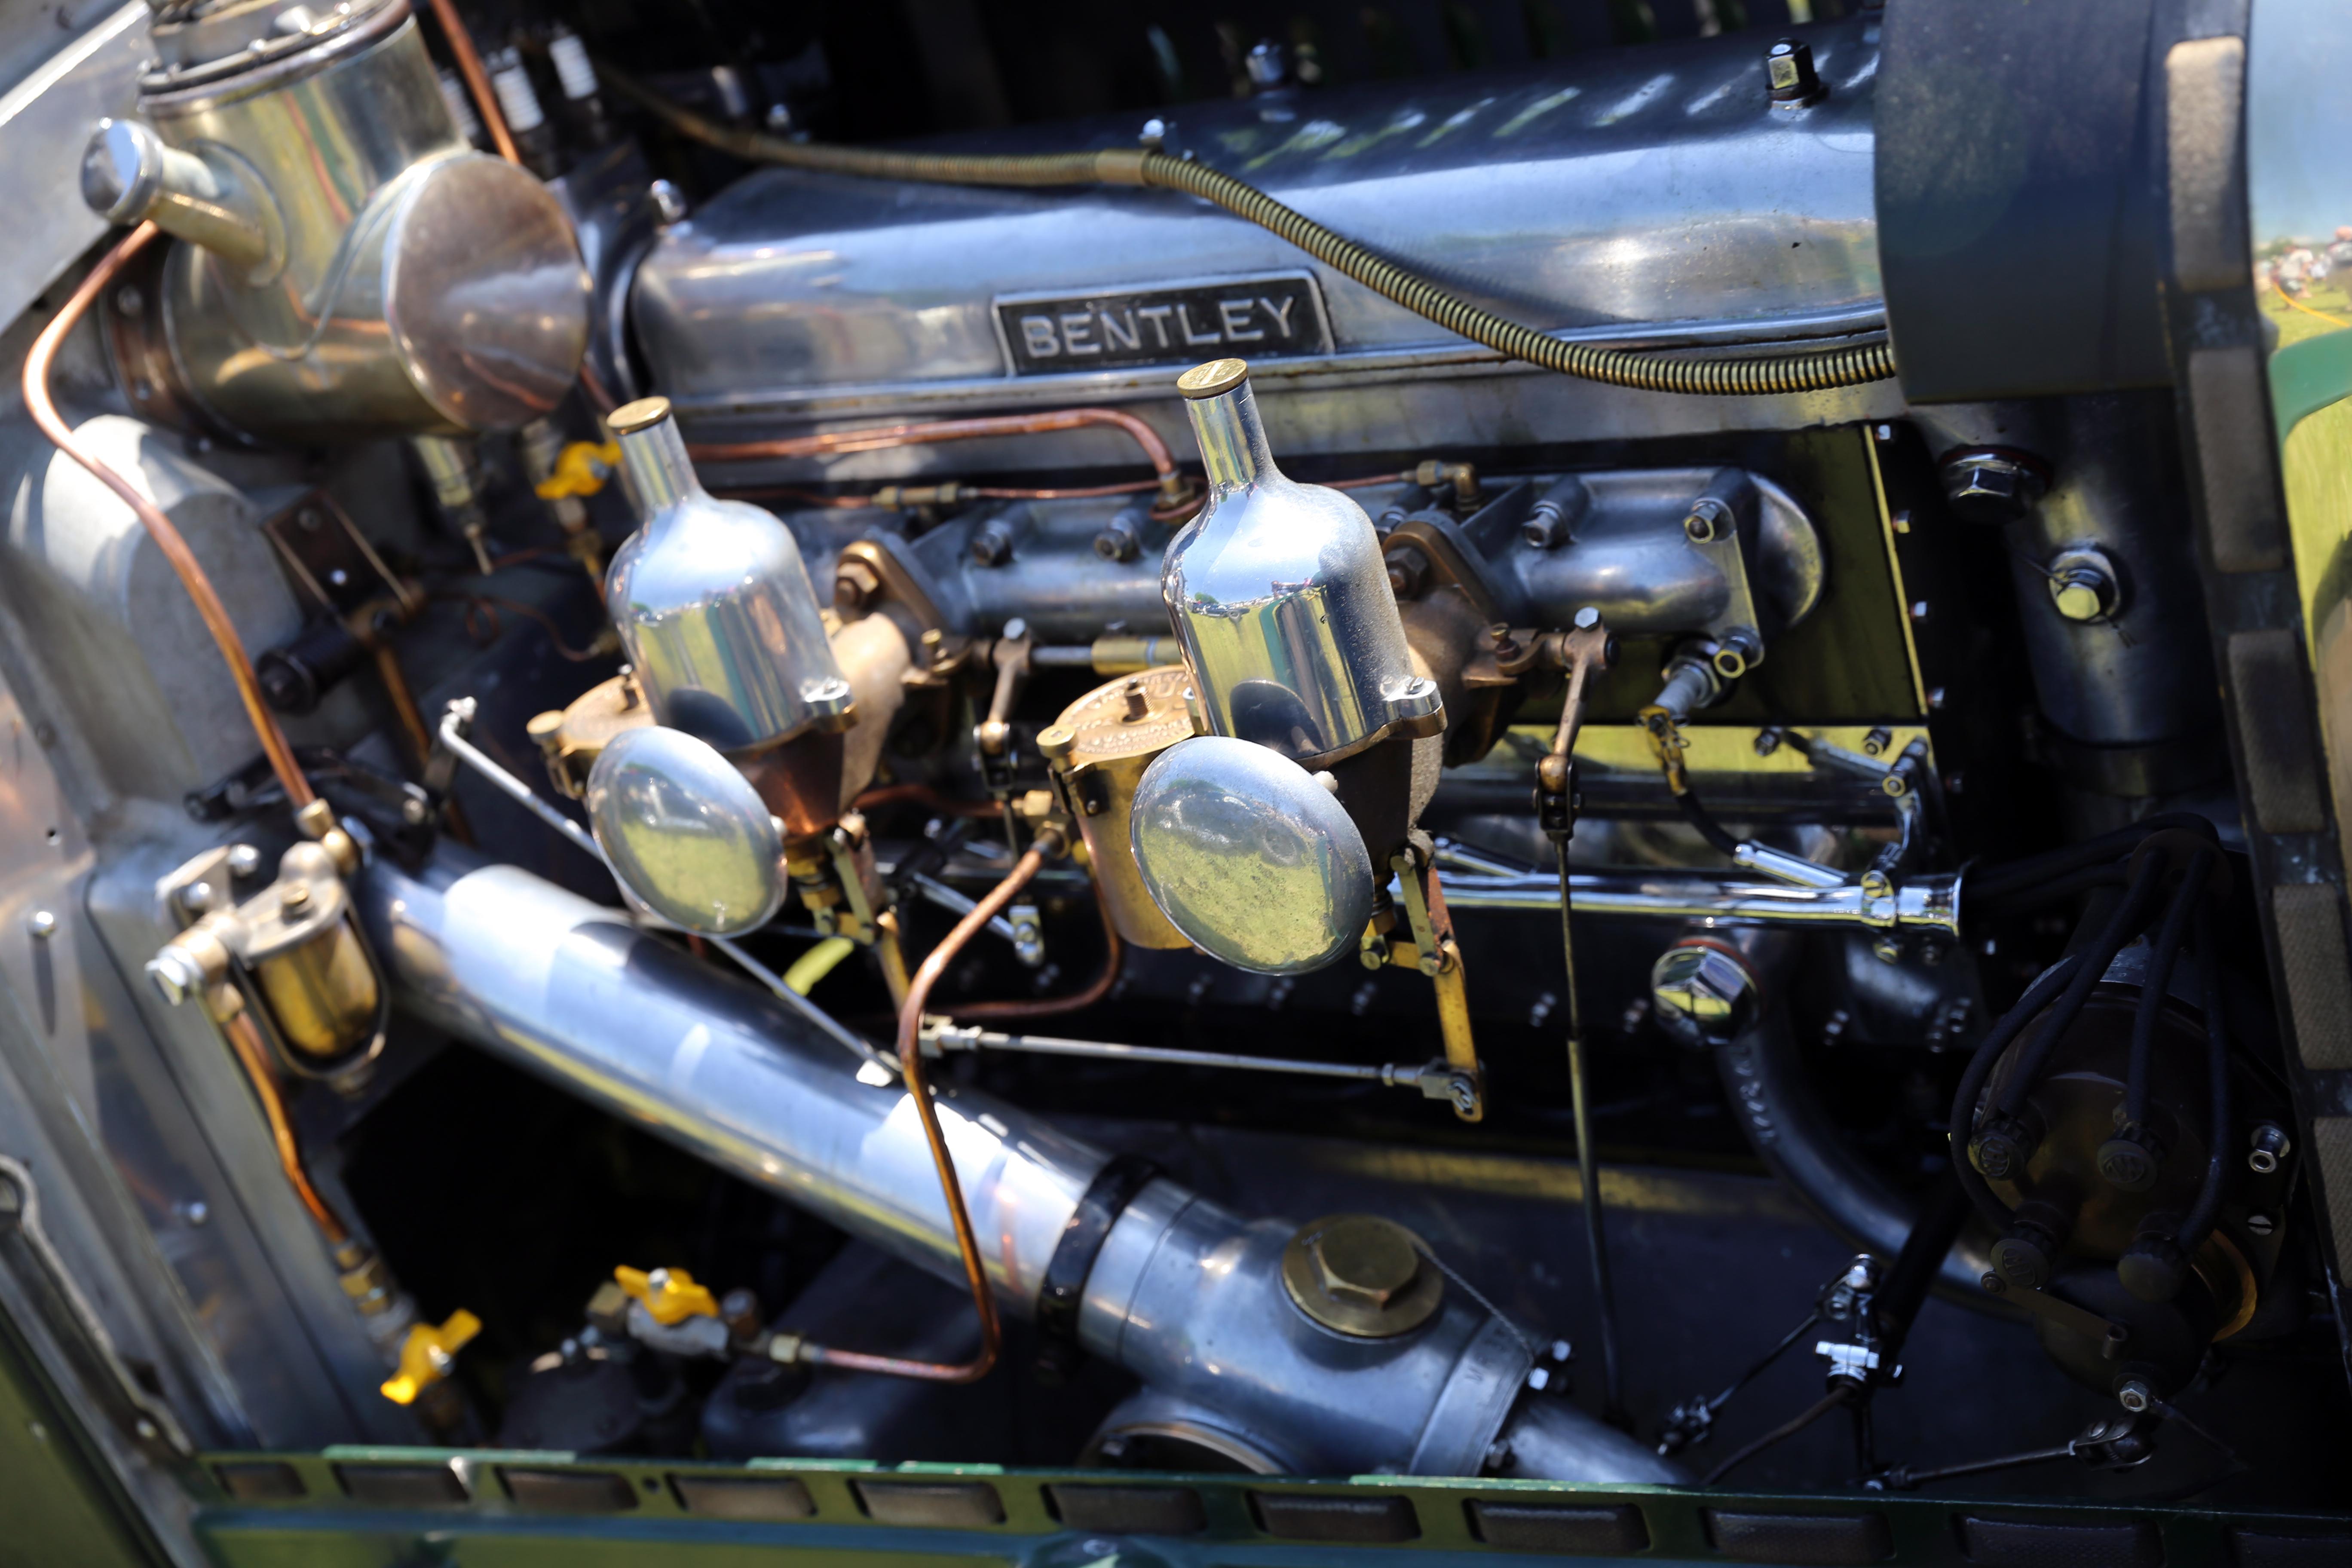 Bentley Blower Engineon E30 Radio Wiring Diagram